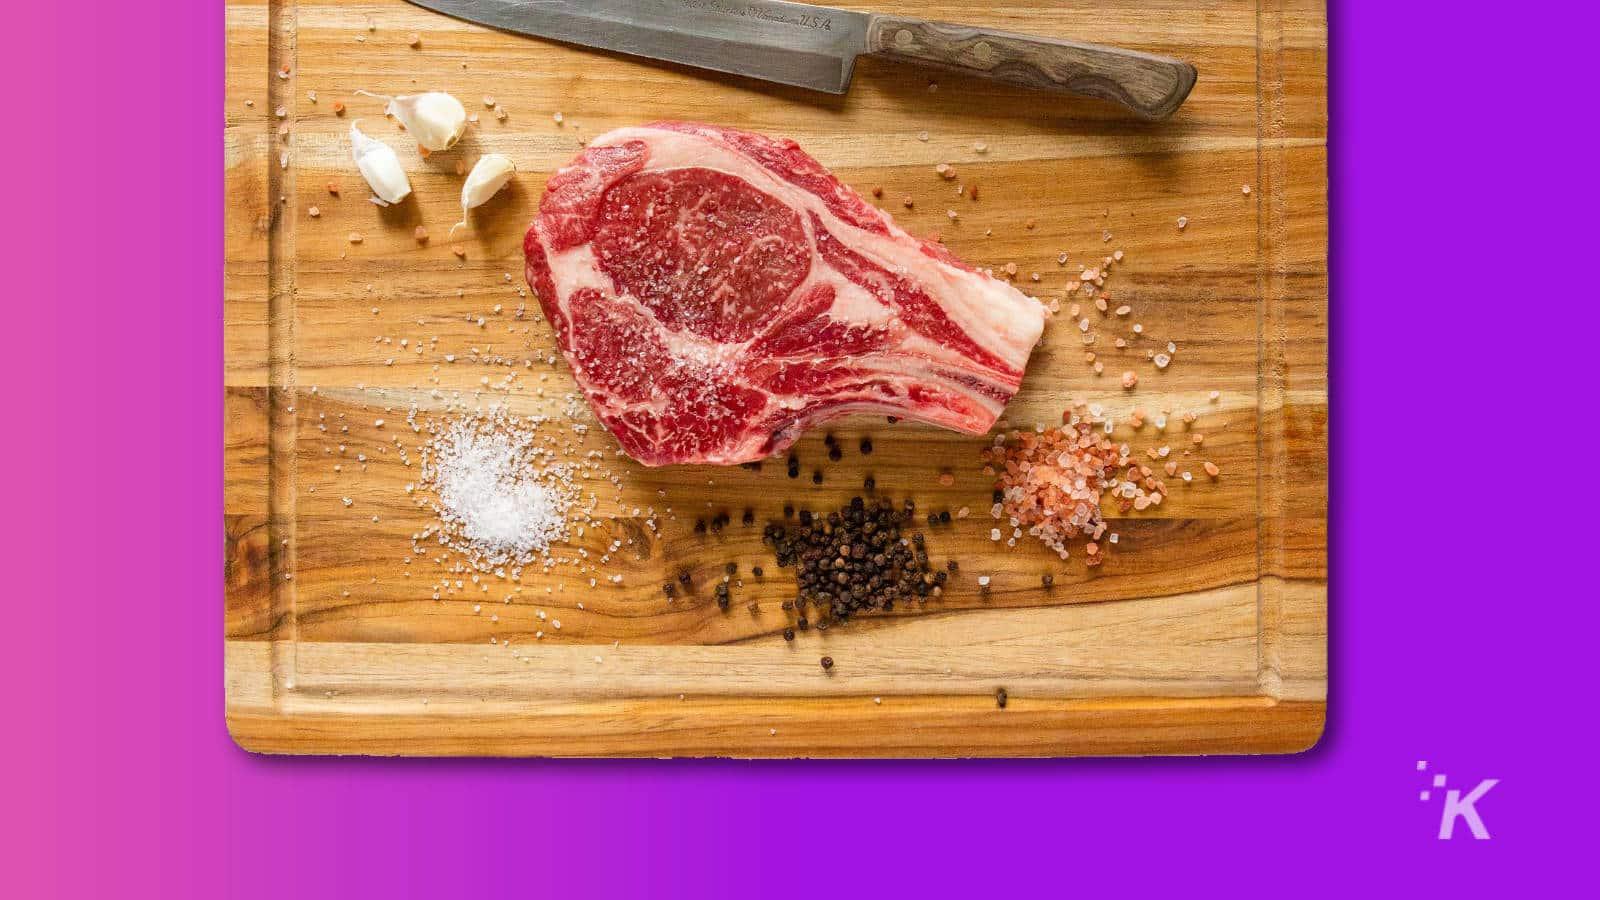 kansas city cattle co steak on a chopping board